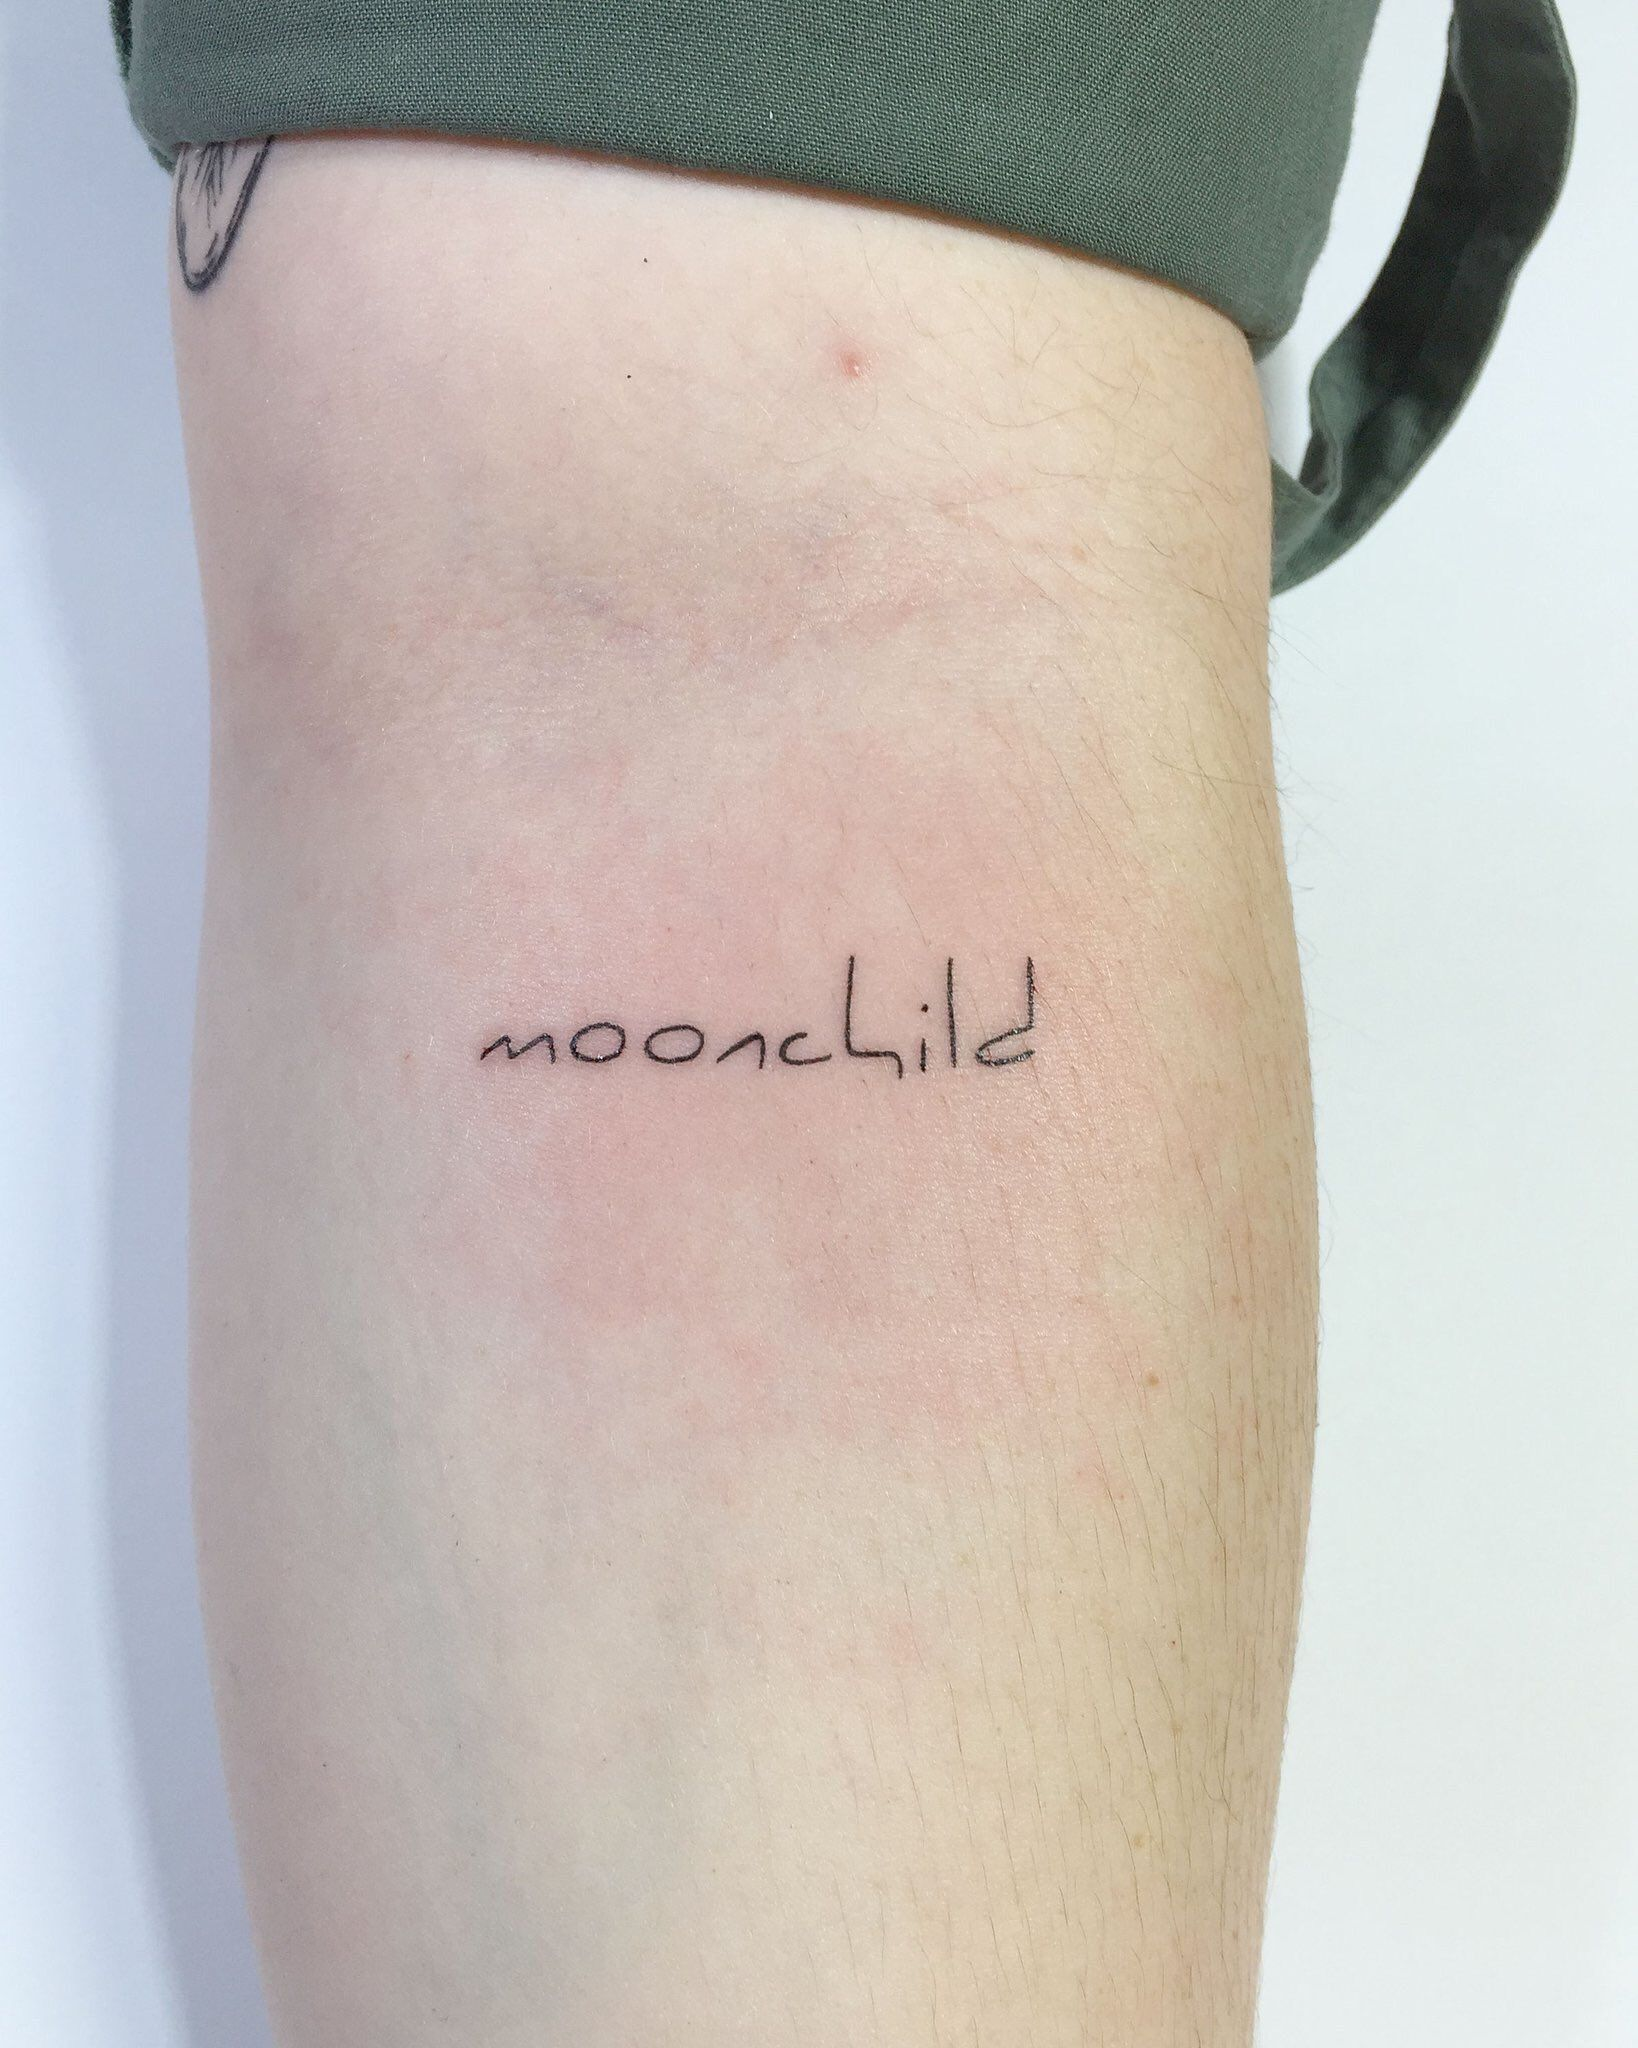 Bts Tattoos On Bts Tattoos Bts Tattoos Kpop Tattoos Tattoos